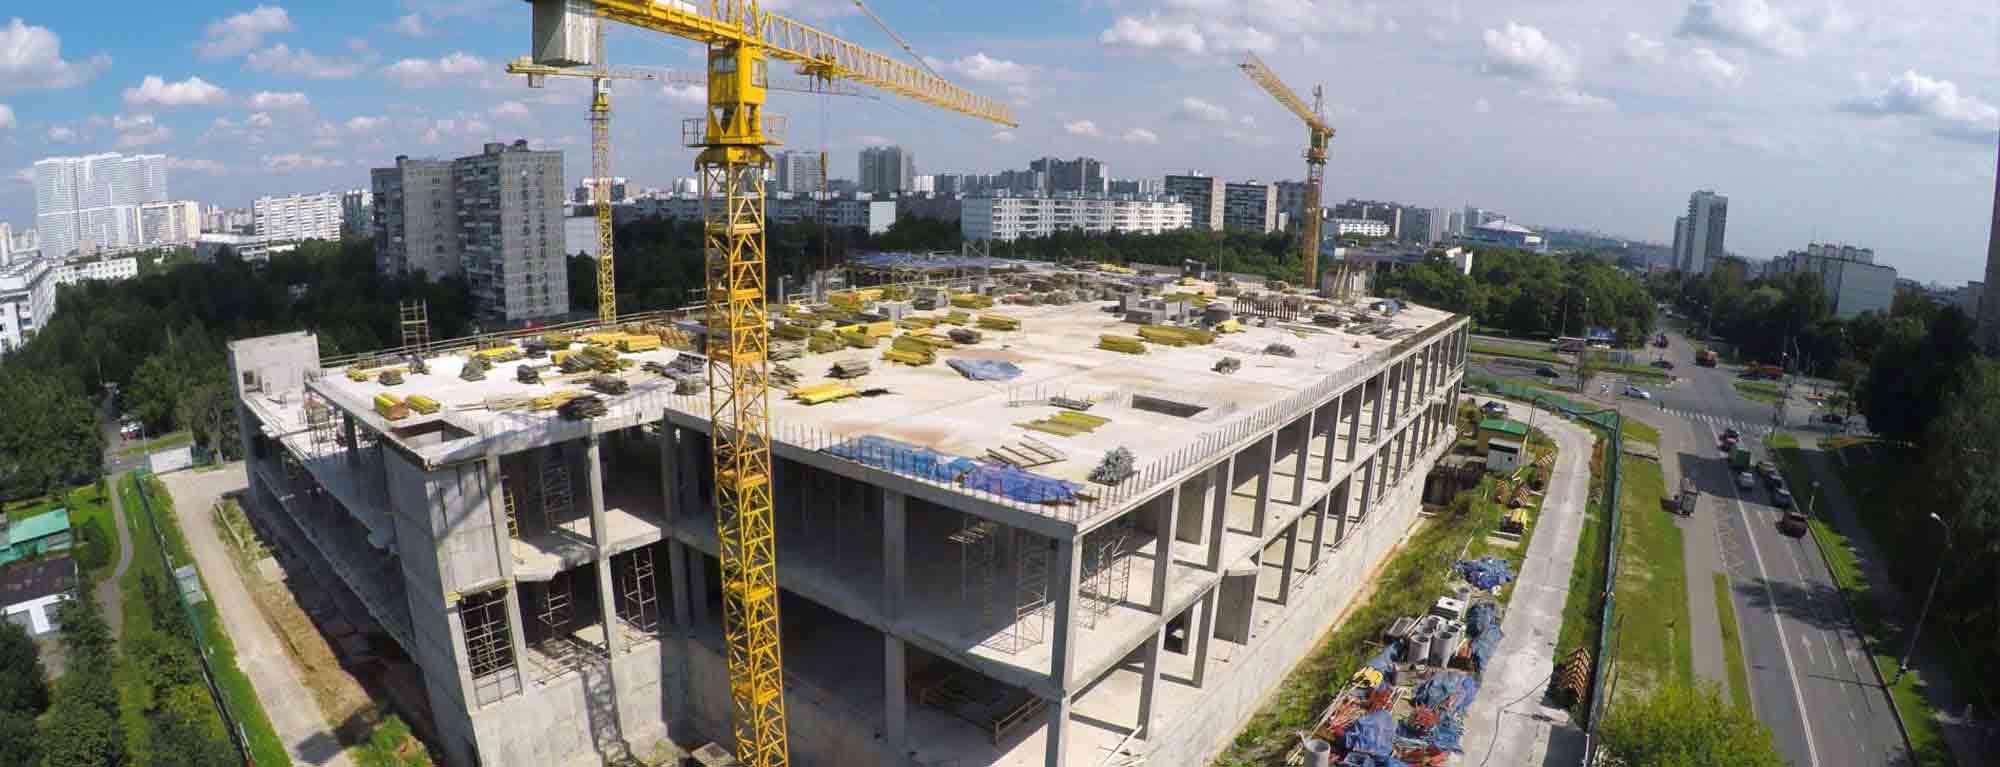 Urban infrastructure building site